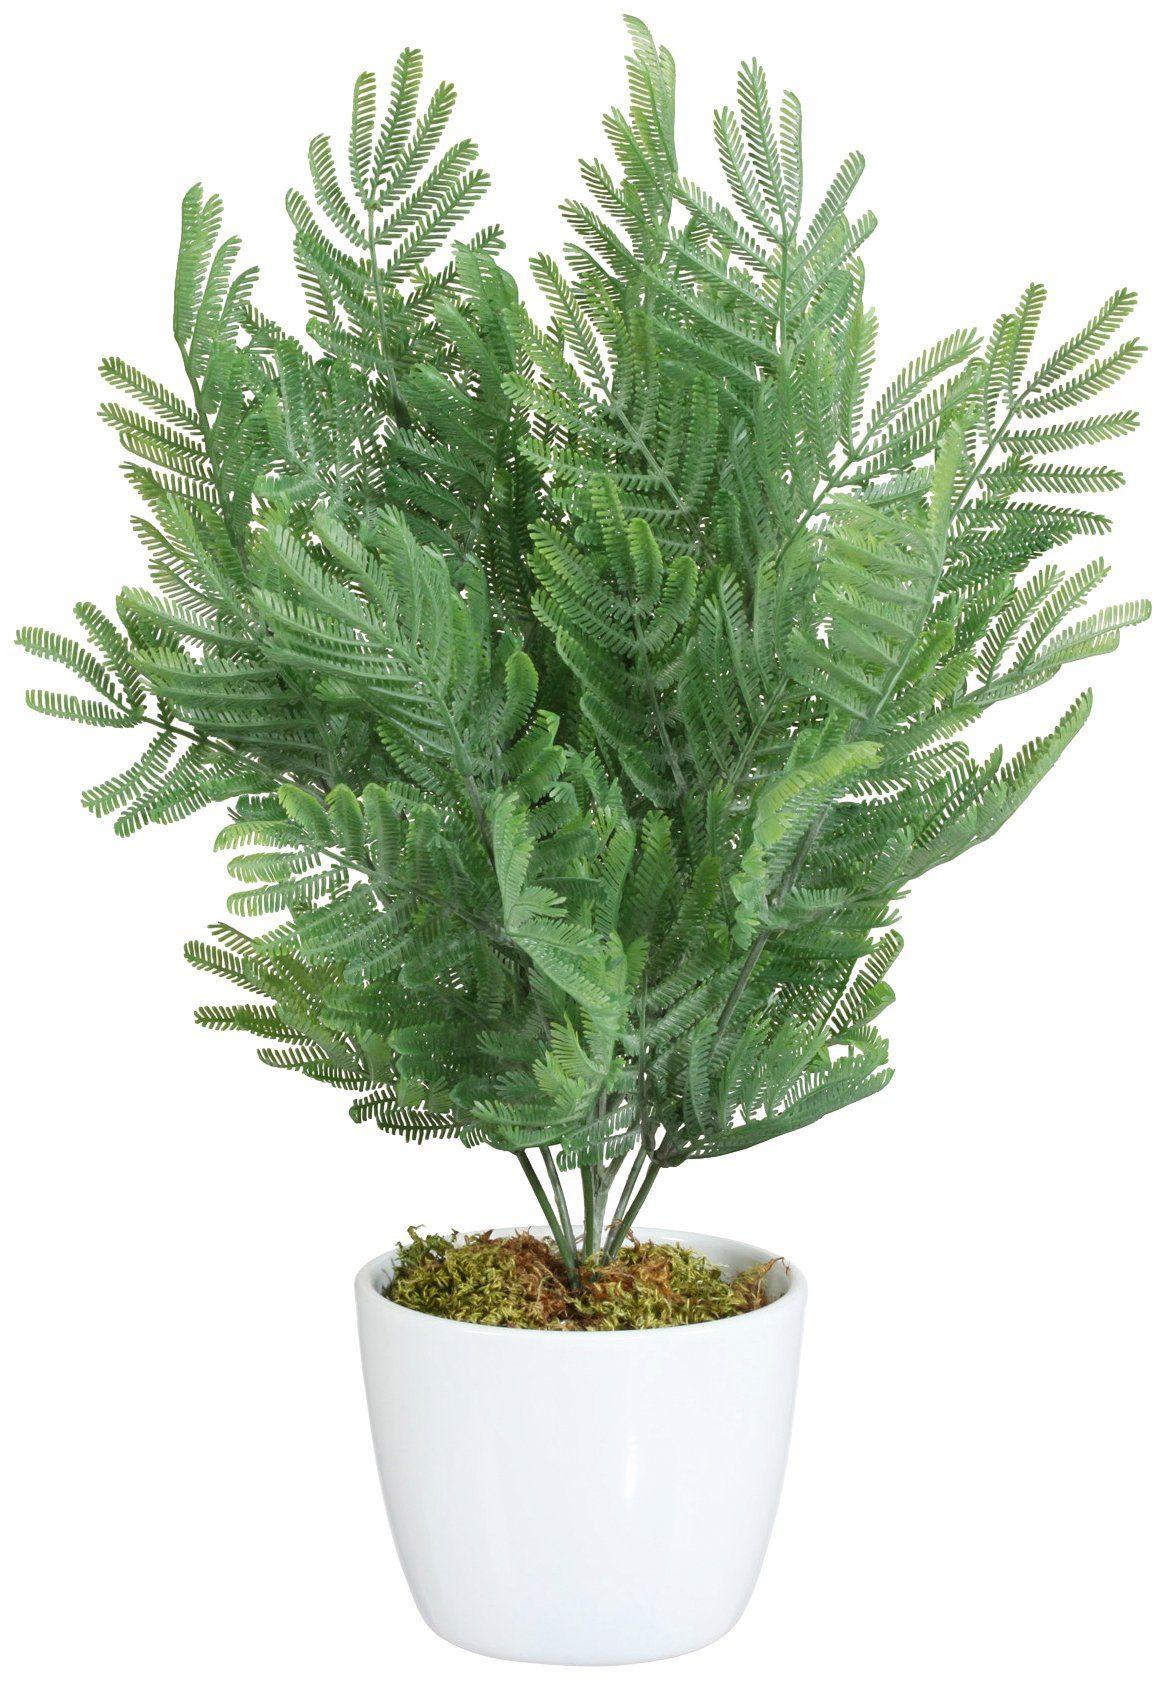 Kunstpflanze »Farn«, im Keramiktopf, Höhe 40 cm